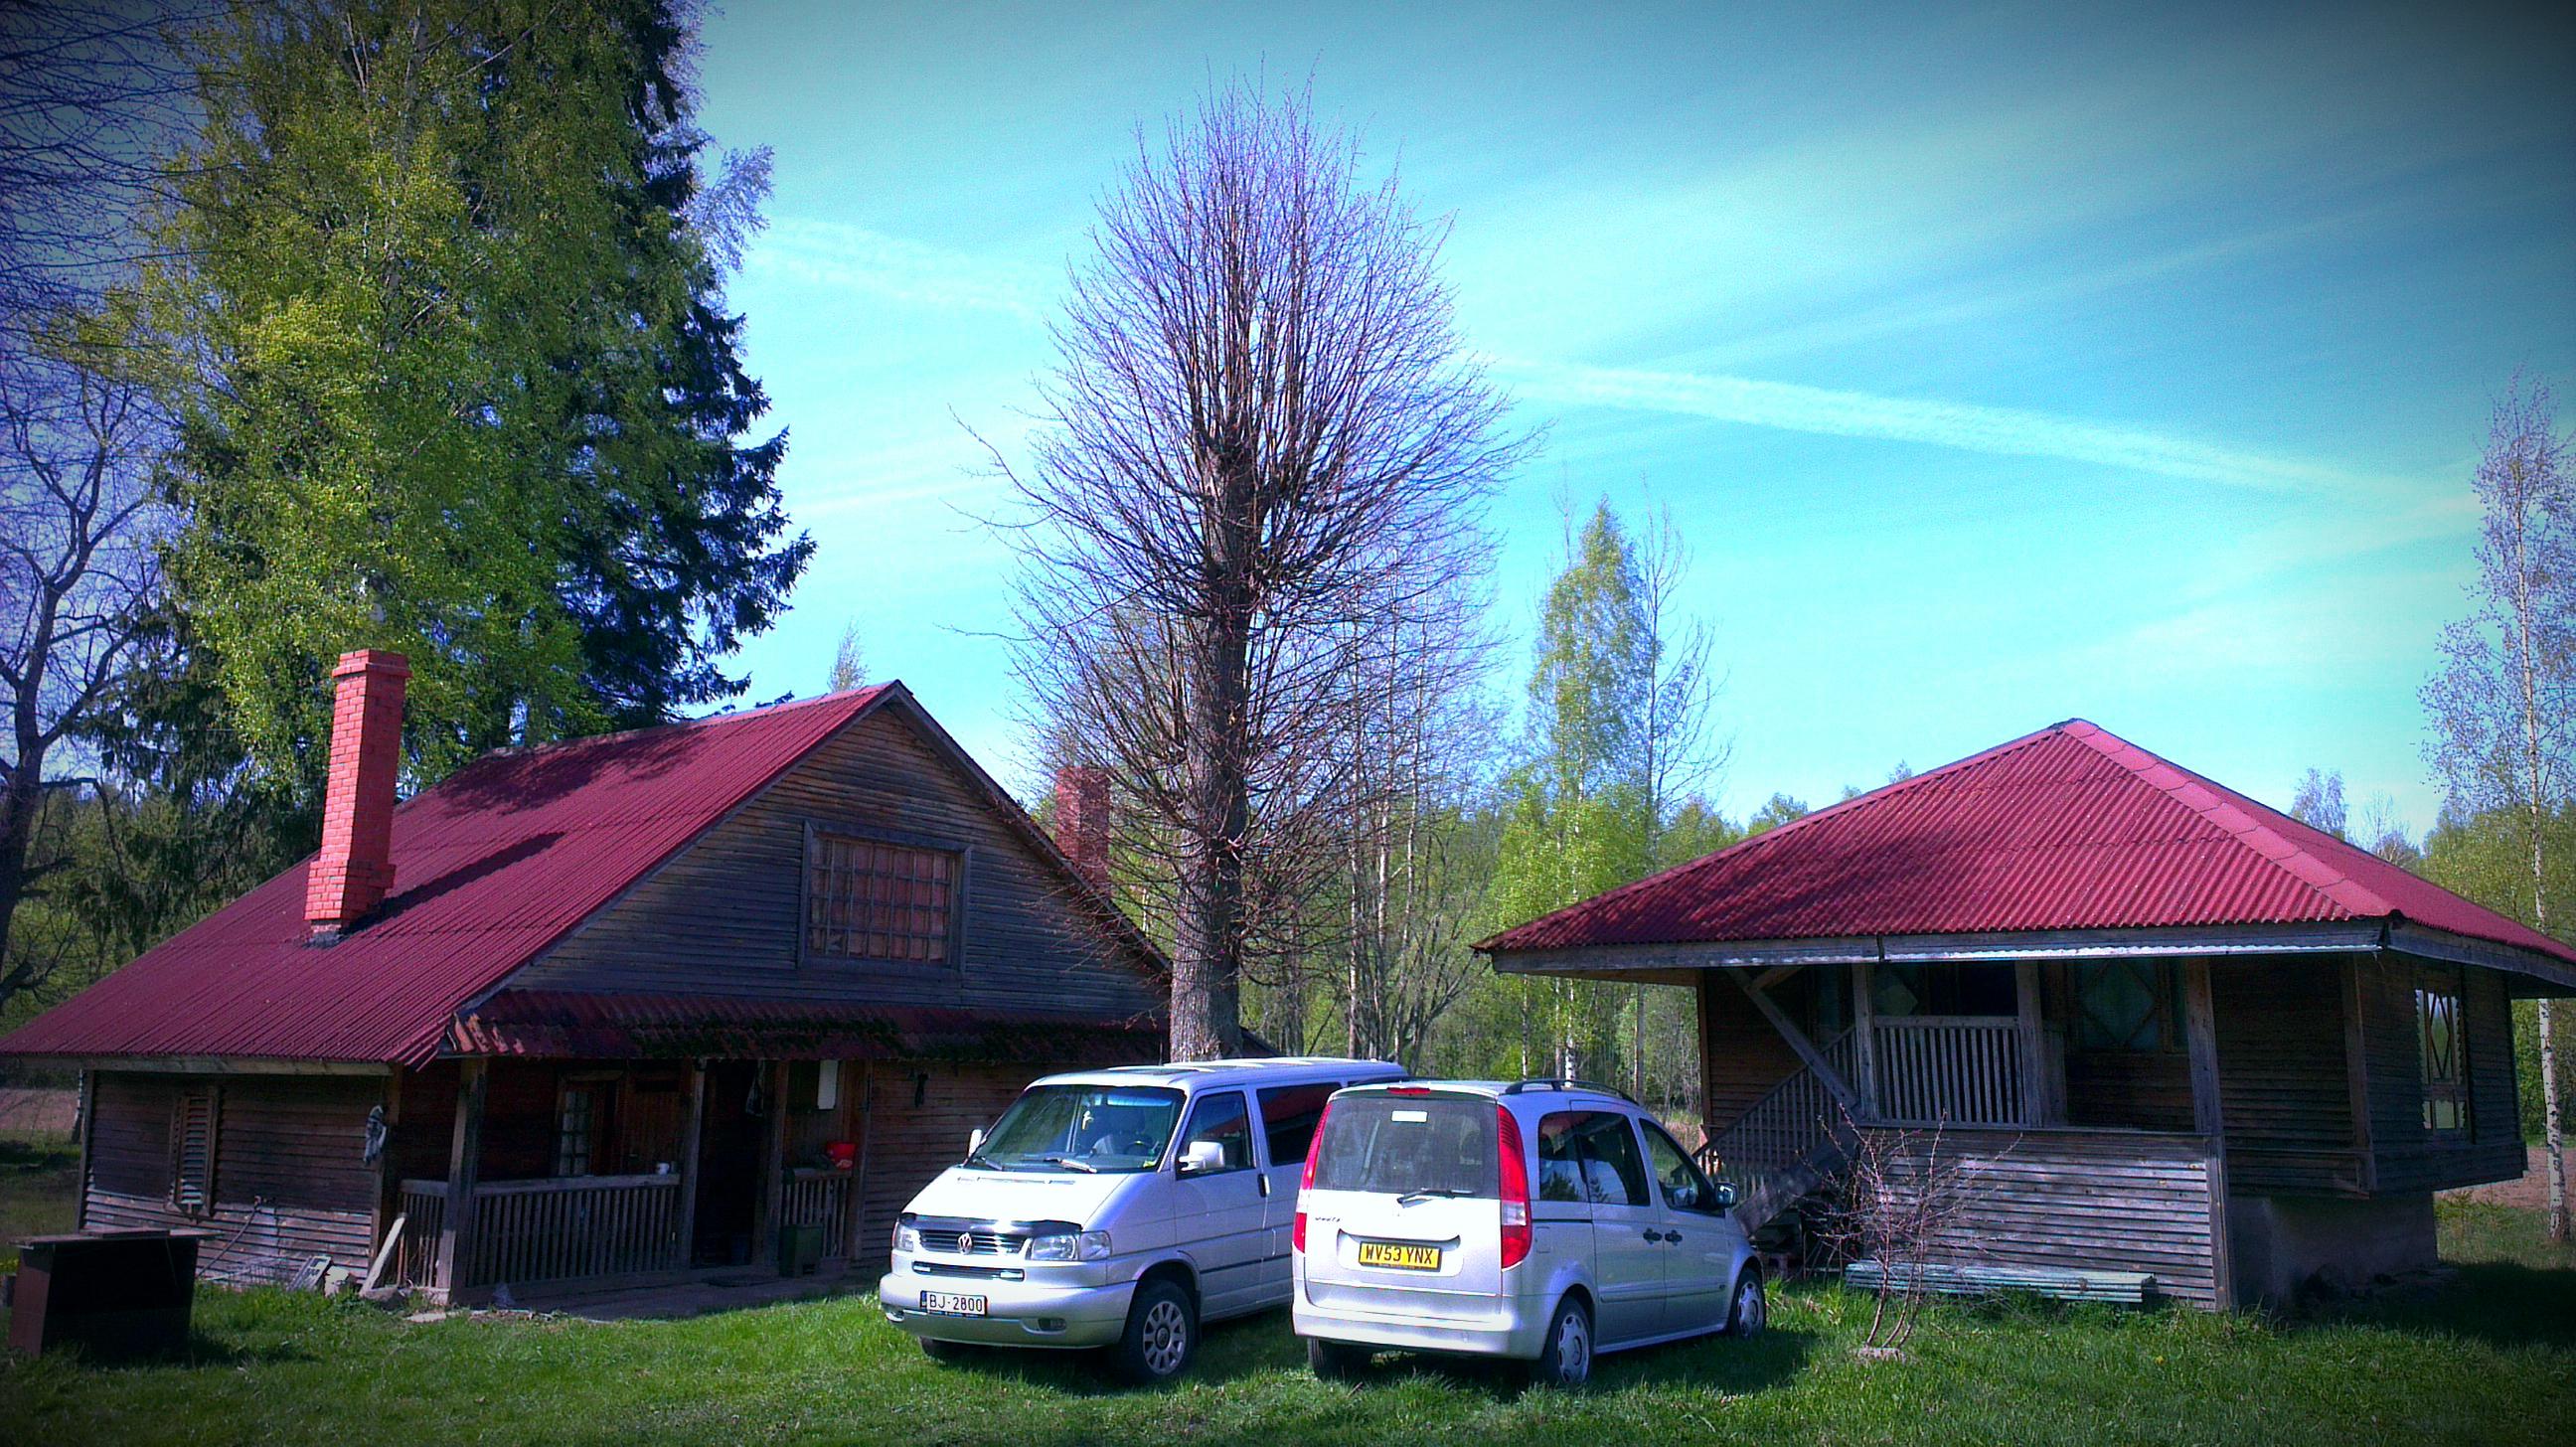 Vente terrain agricole salacgriva limba i lettonie for Agrandissement maison terrain agricole